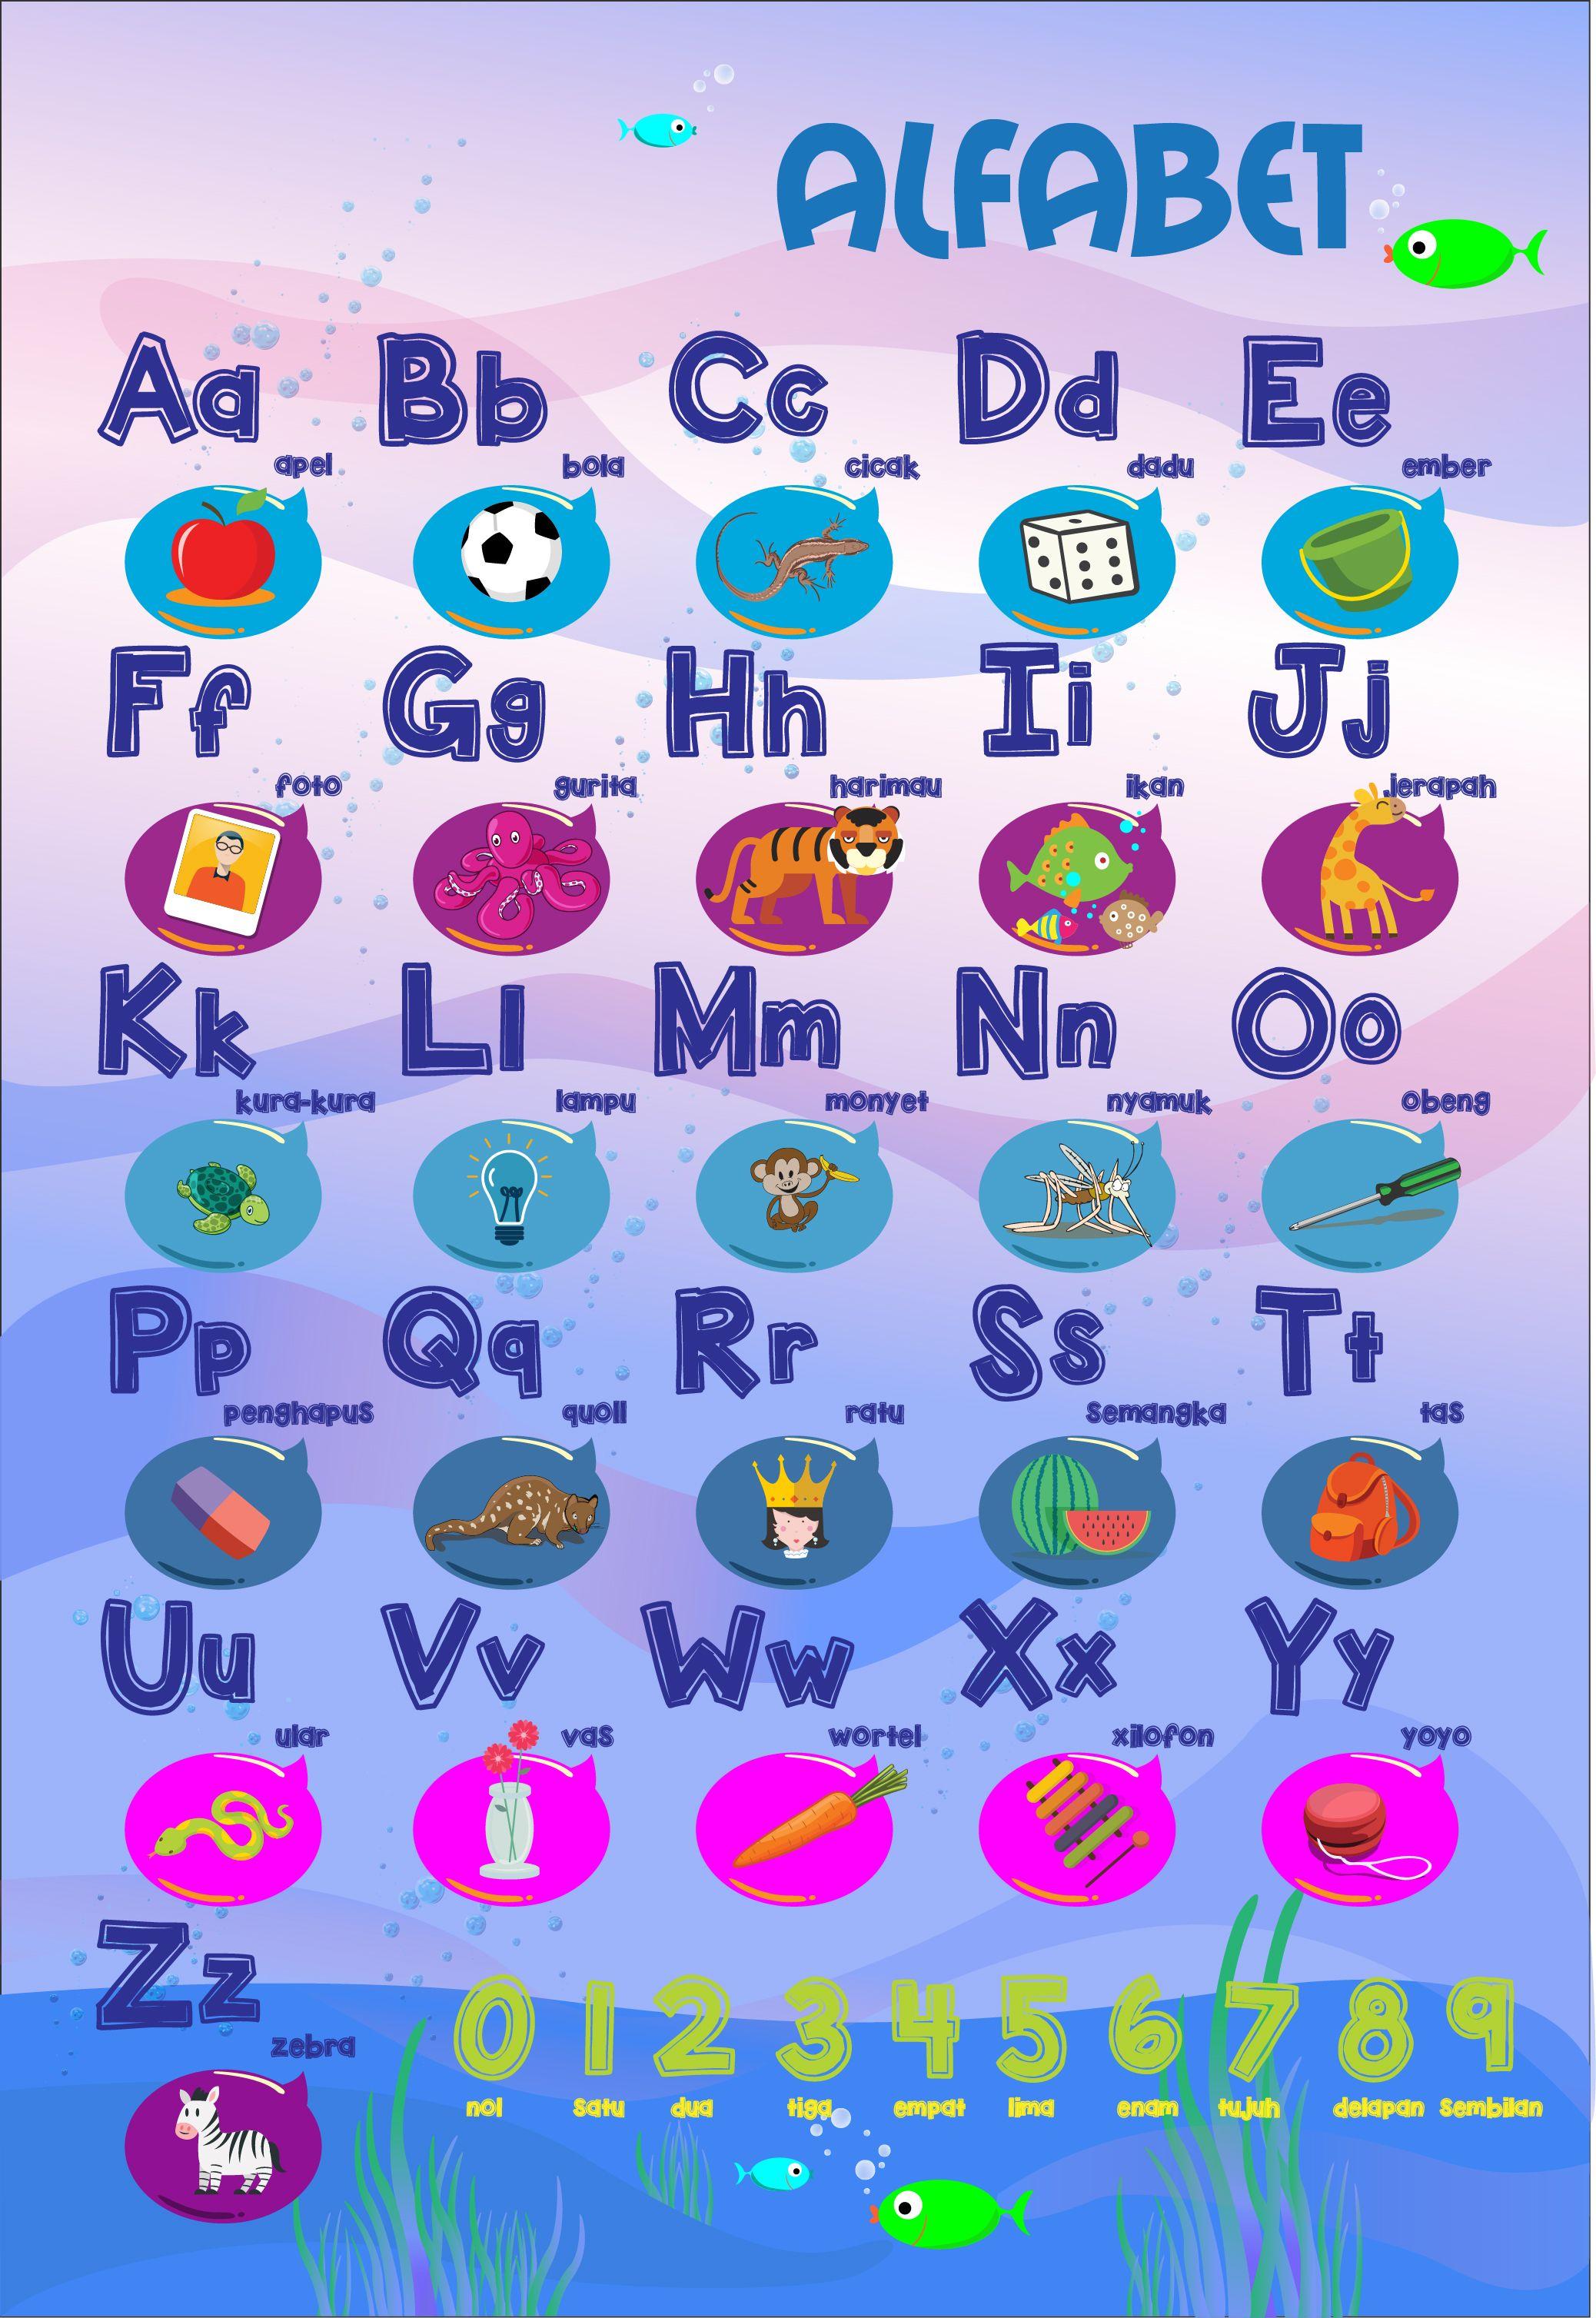 Indonesia Kids Alphabetic Poster Artwork Poster Alphabet Learning Kids Vector Alfabet Alphabet Pendidikan Dasar